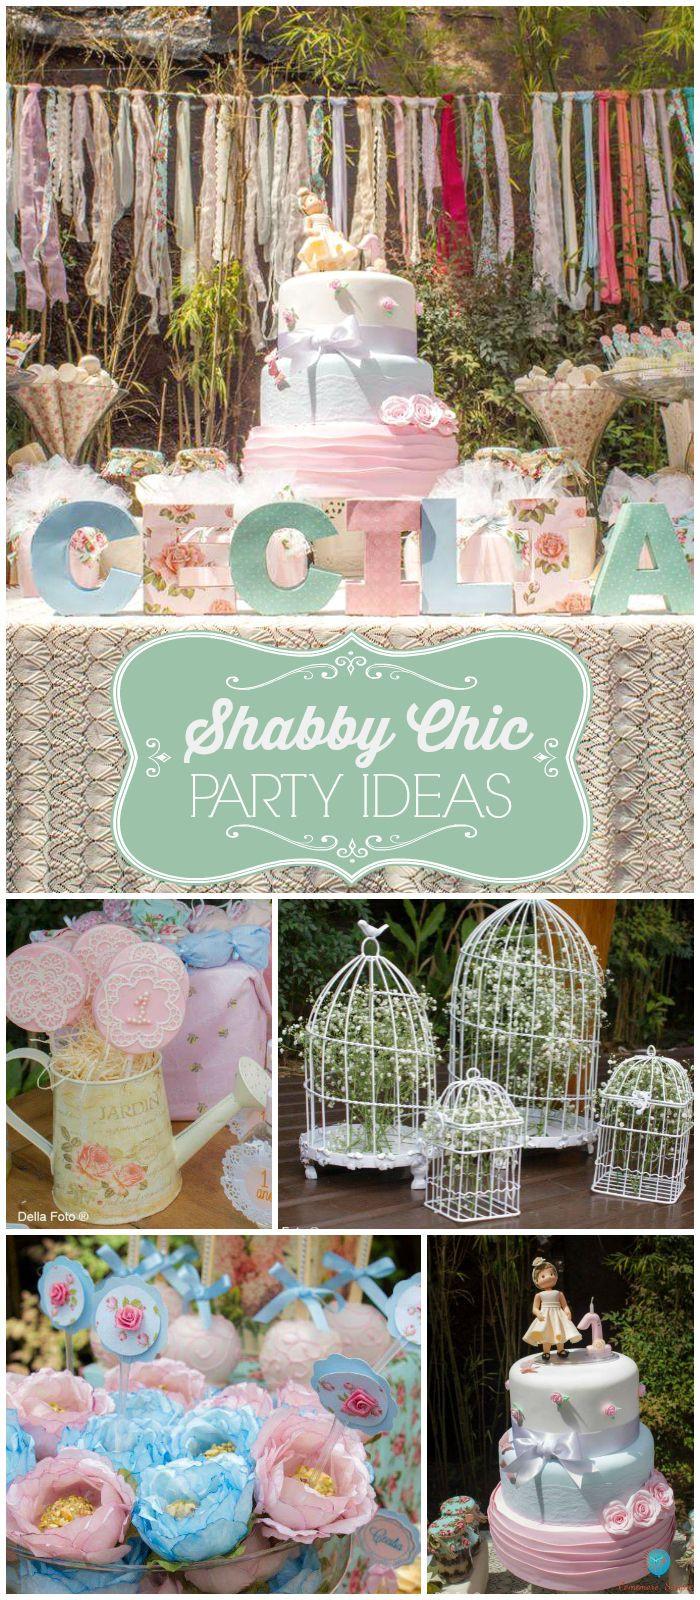 Shabby Chic Birthday Decorations  25 best ideas about Shabby Chic Birthday on Pinterest